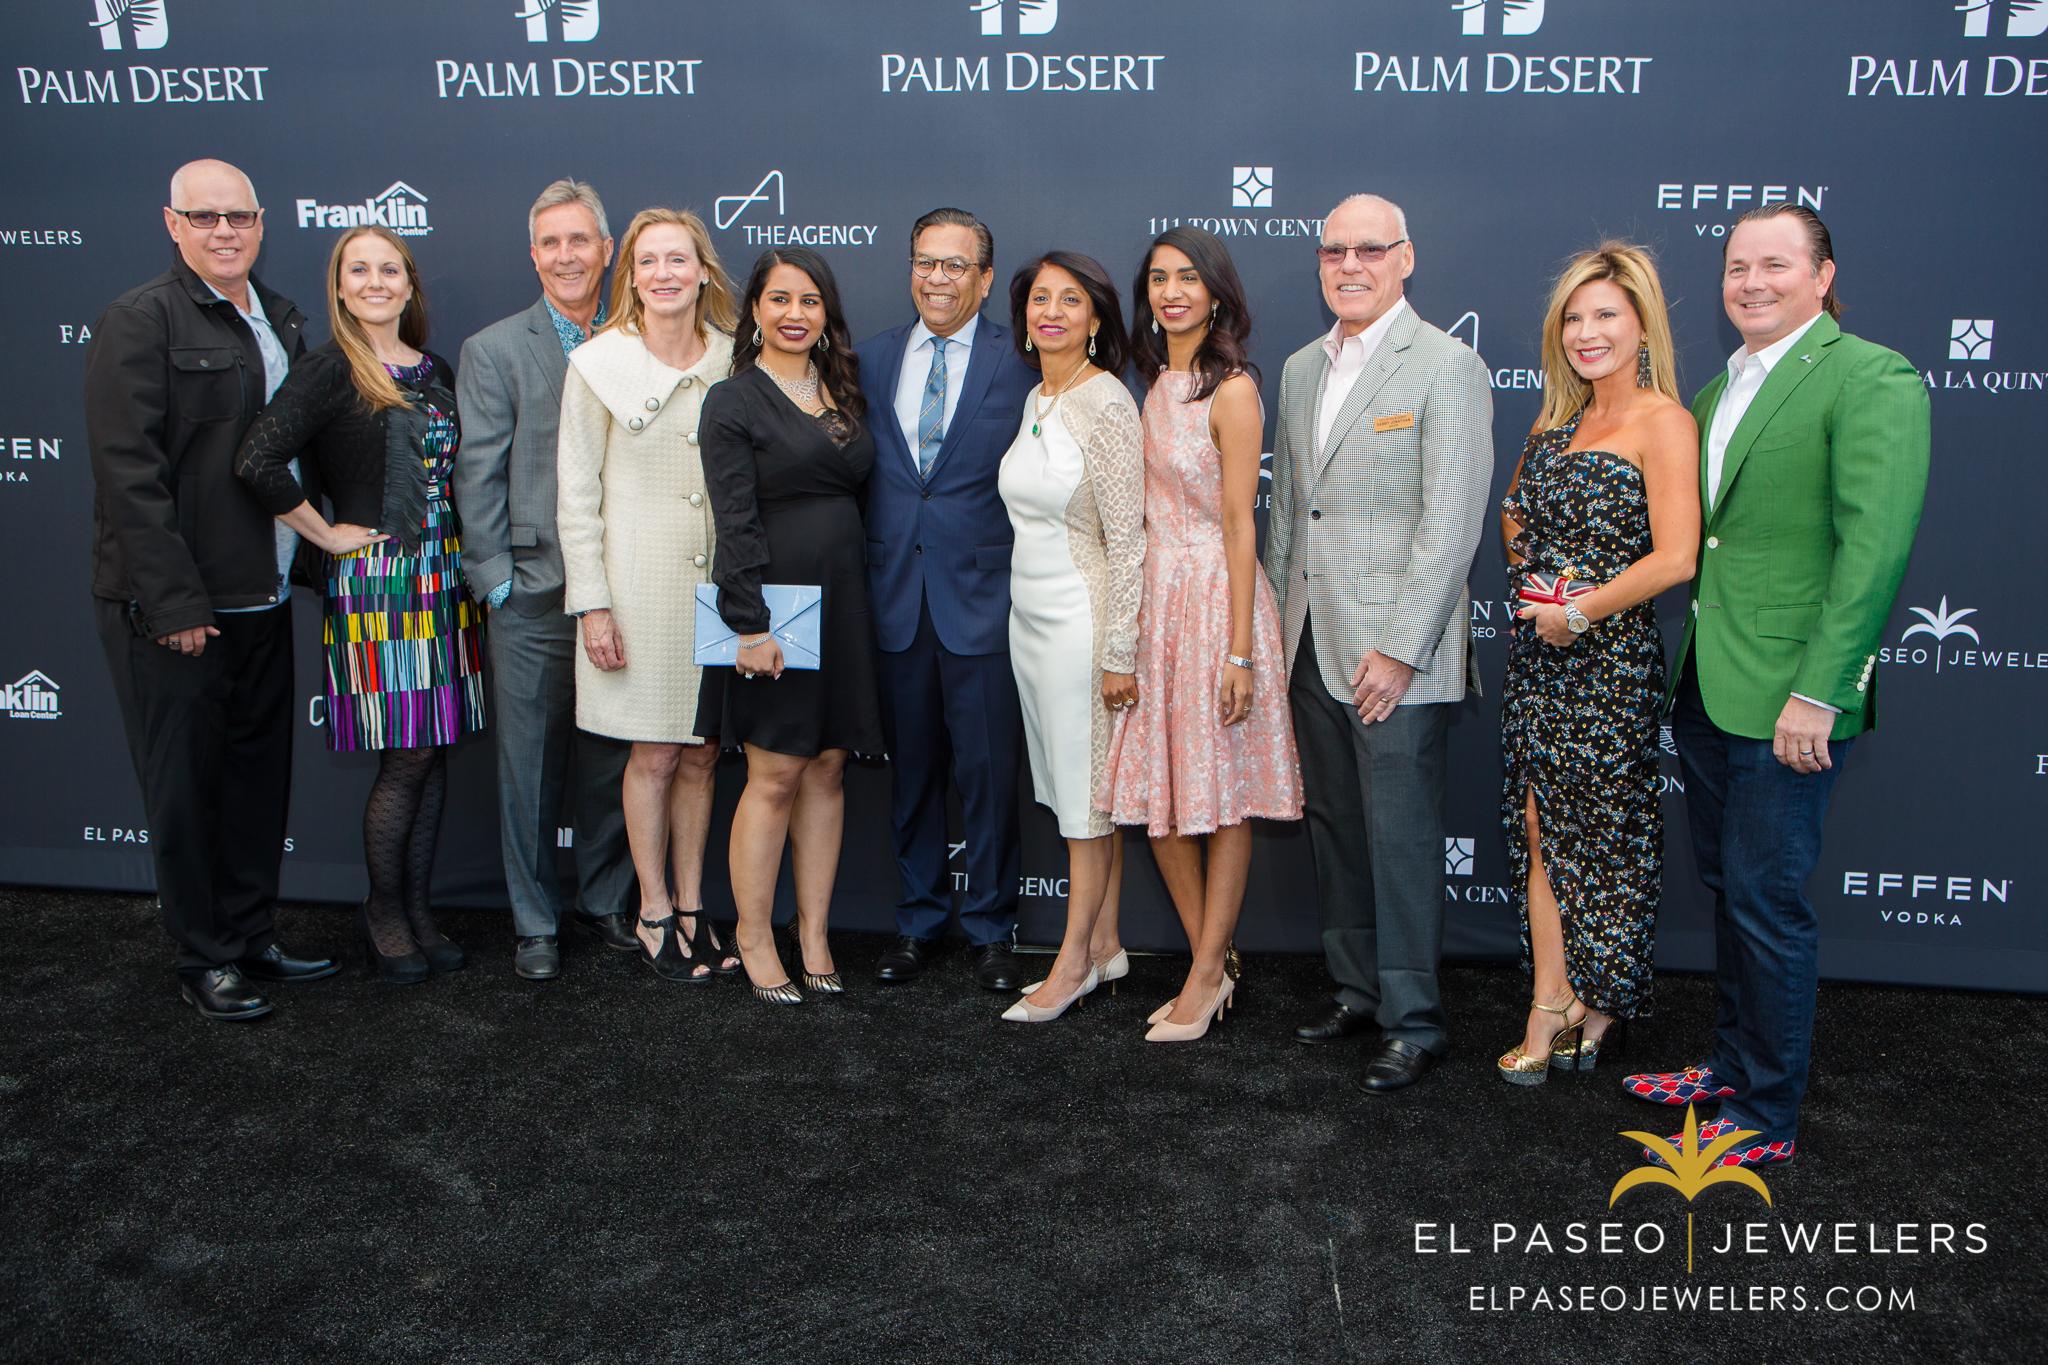 California Dreamin' El Paseo Jewelers Fashion Week El Paseo 2018